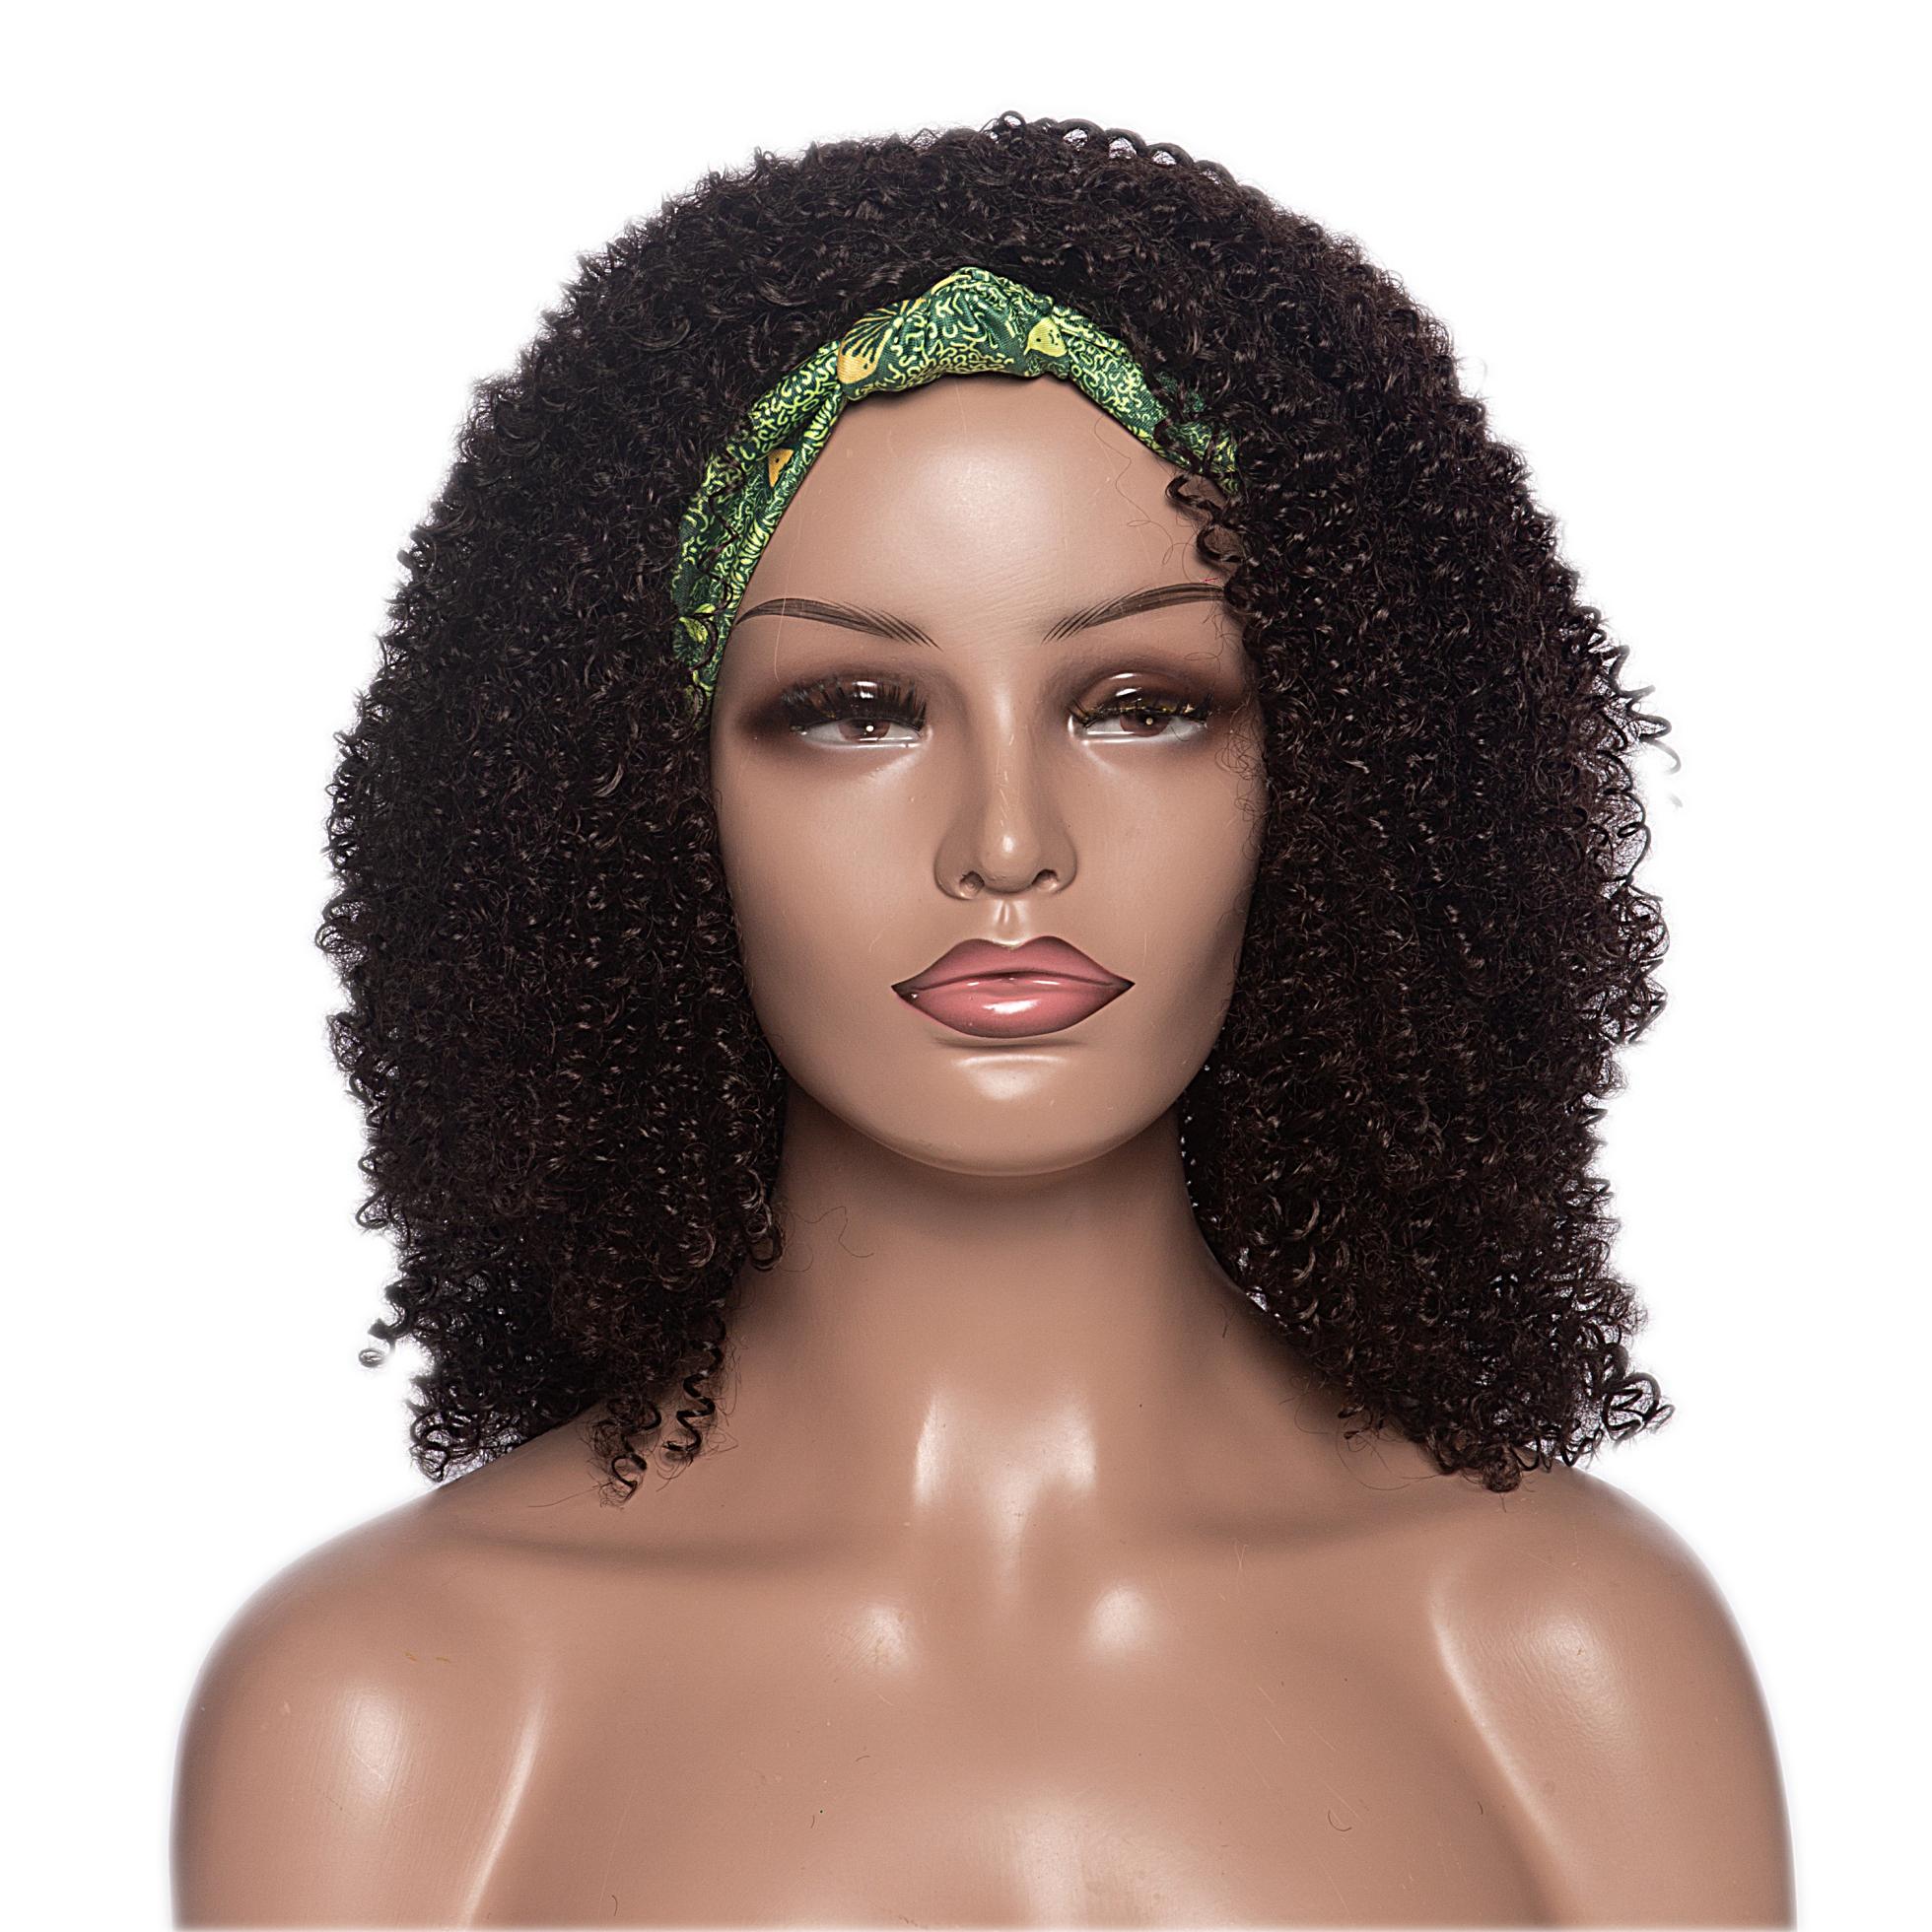 Aishili High Quality Kinky Curly Wigs Headband Wigs For